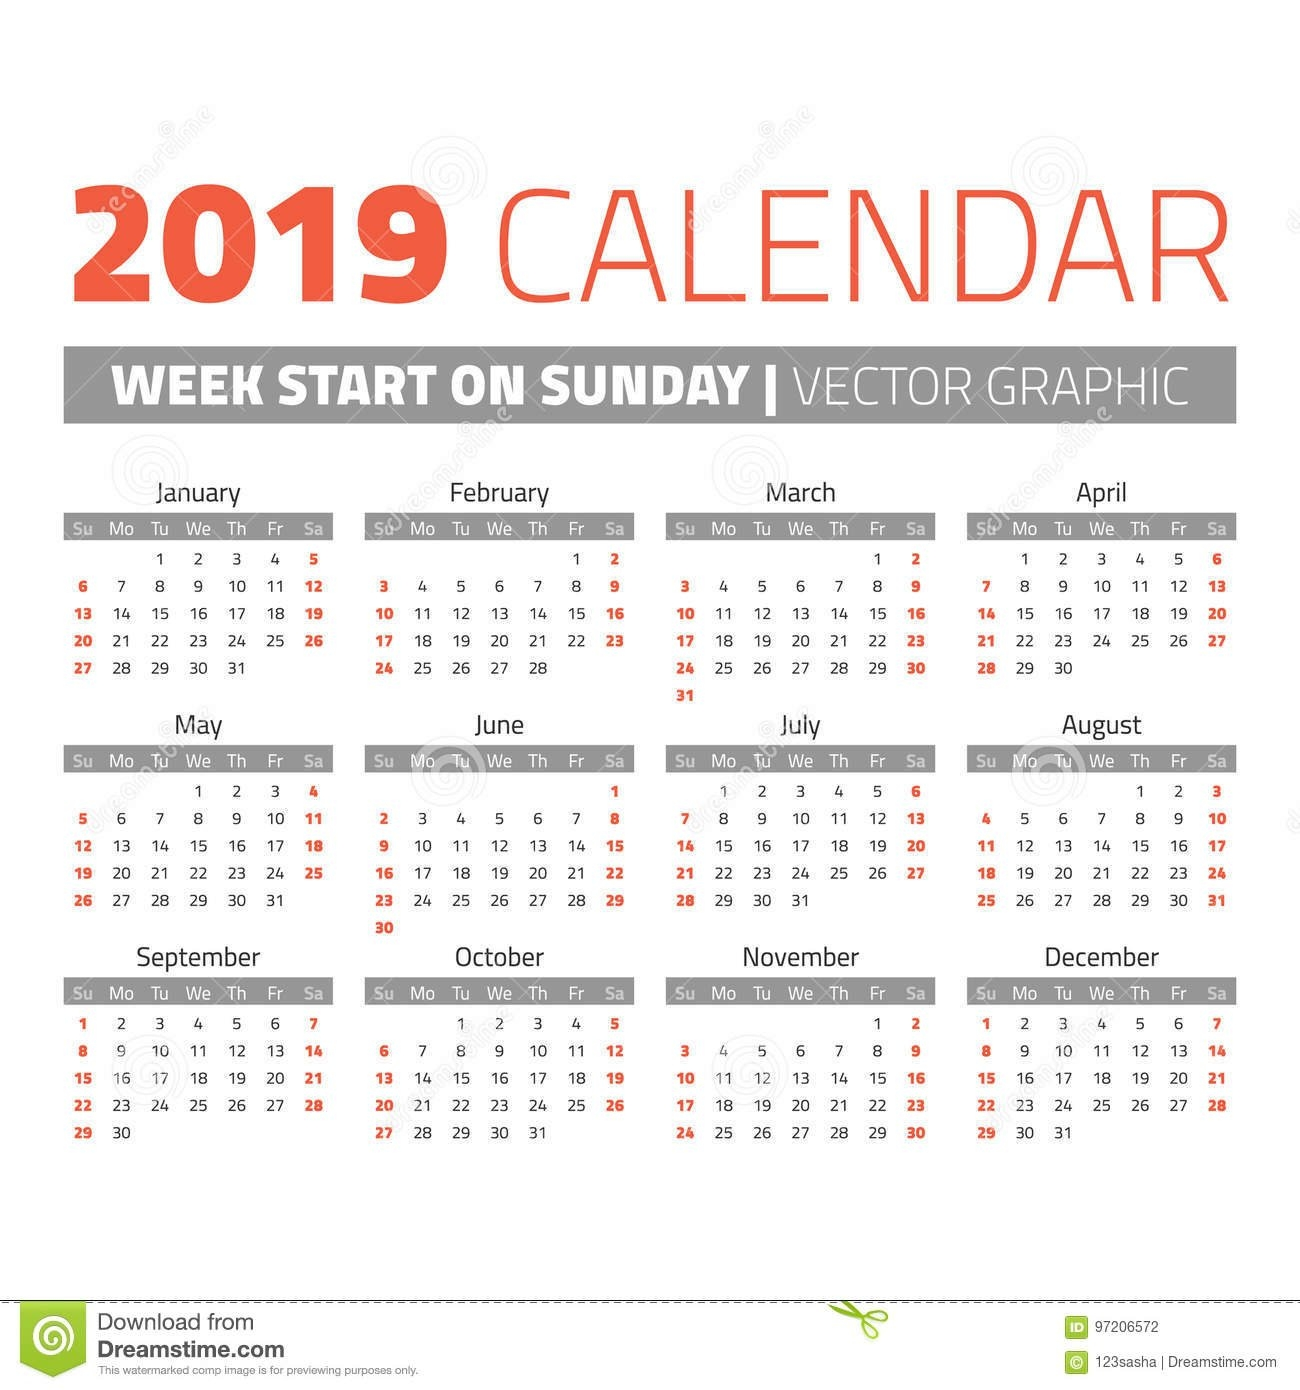 Simple 2019 Year Calendar Stock Vector. Illustration Of Date - 97206572 Calendar Week 8 2019